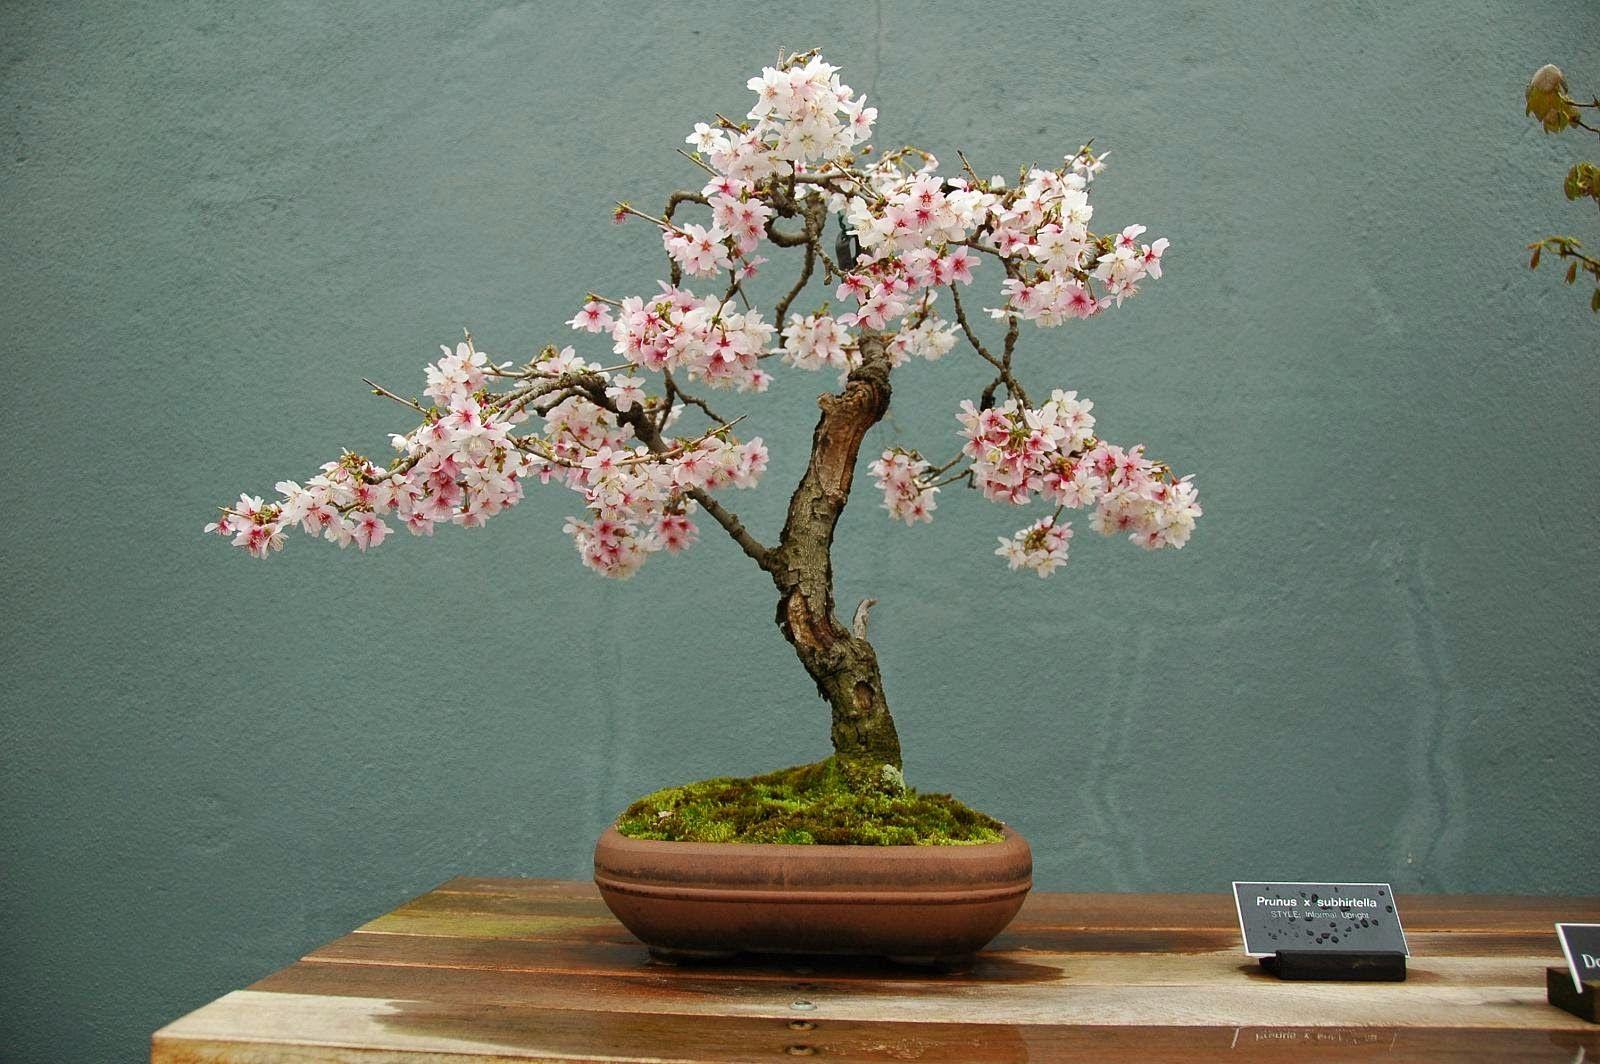 Trees Planet Cherry Blossom Japanese Bonsai Tree Bonsai Tree Types Indoor Bonsai Tree